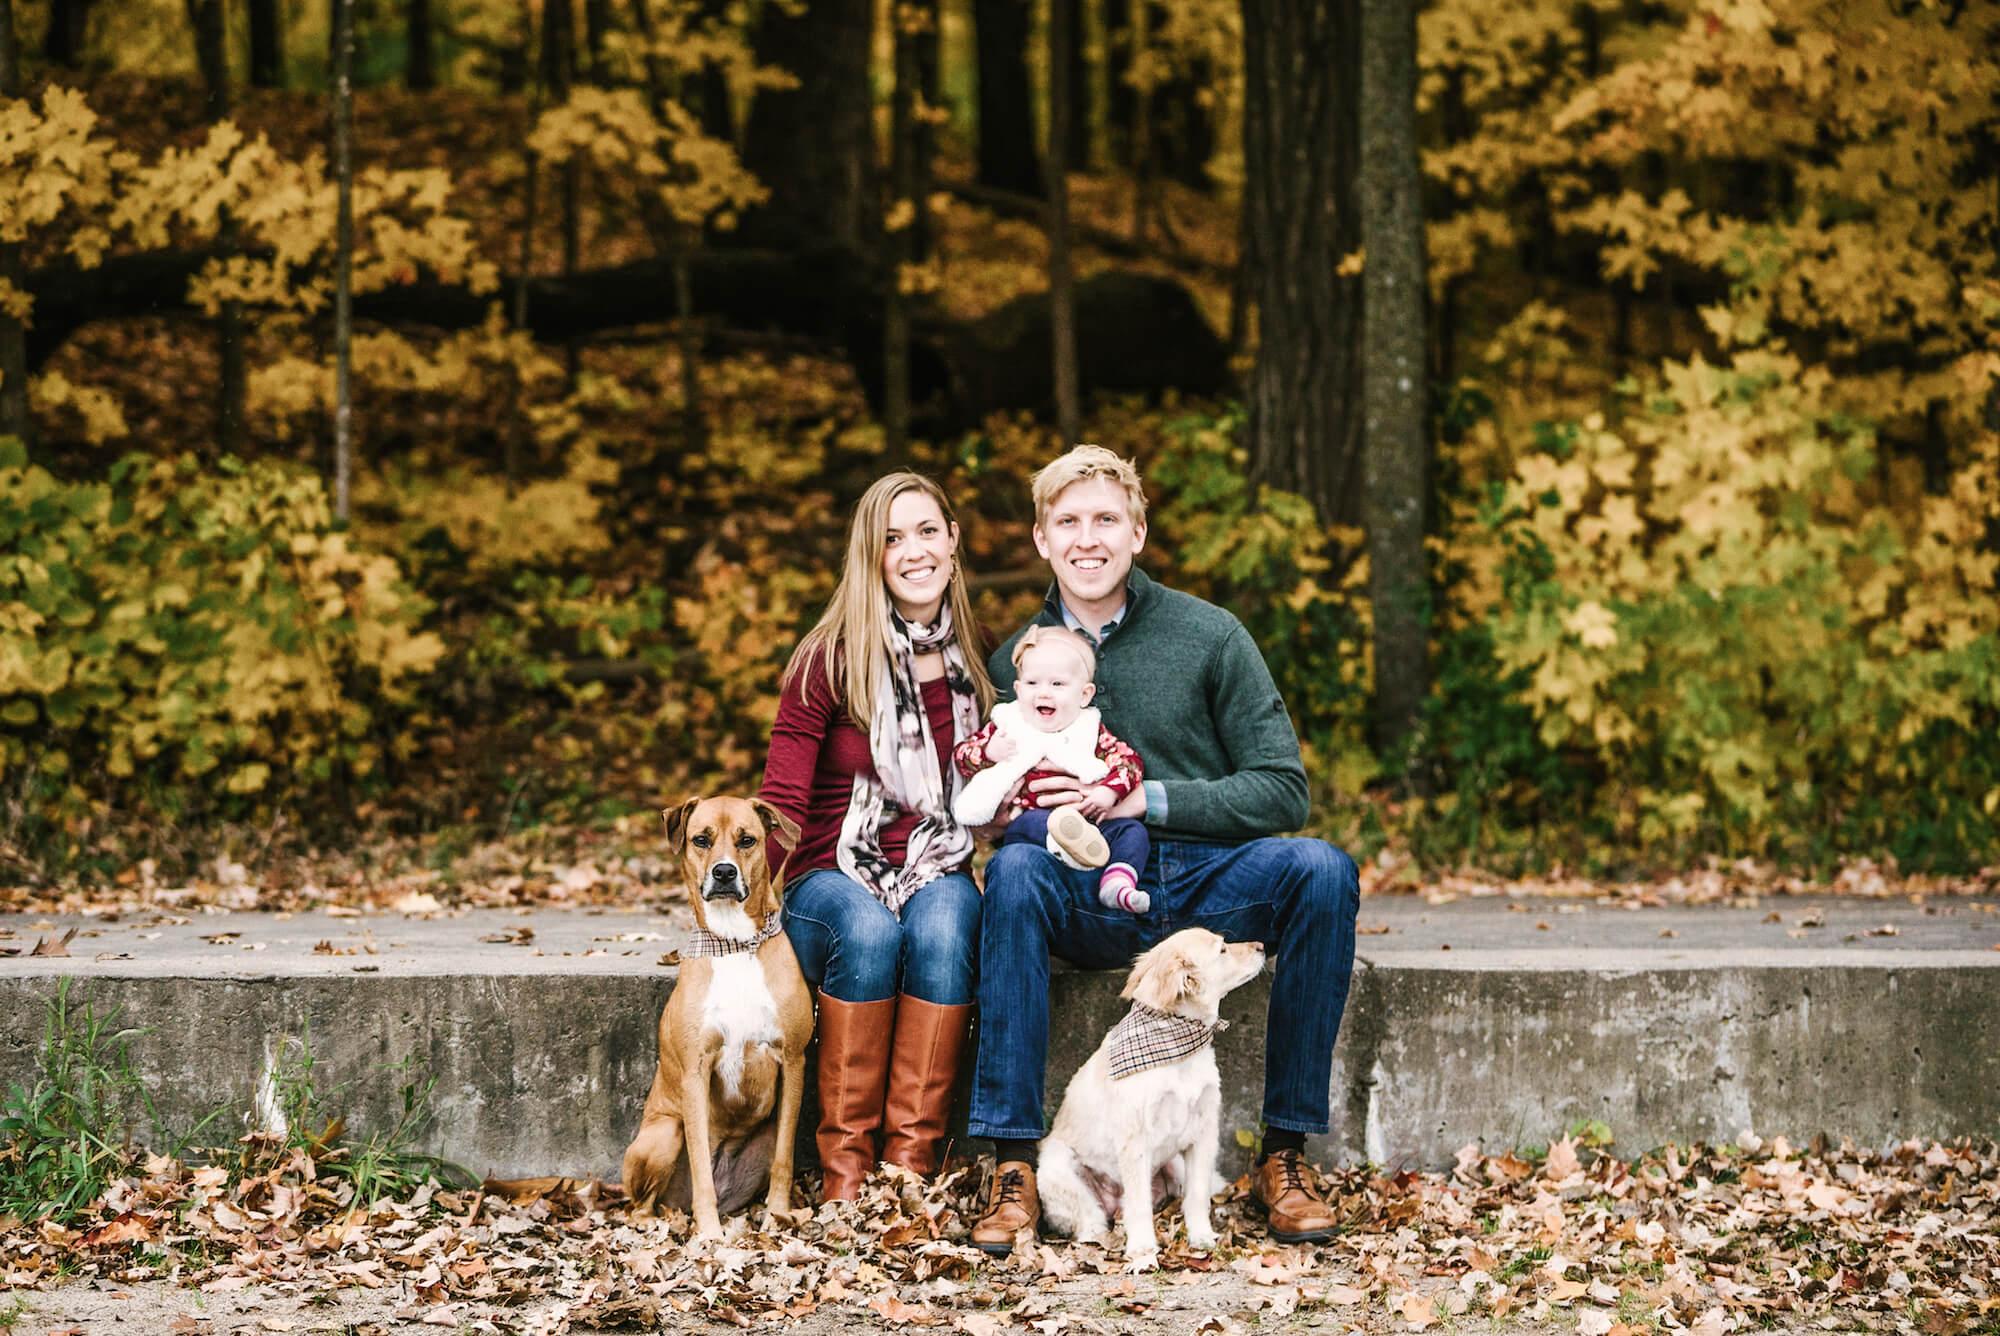 engle-olson-family-photography-session-22.jpg